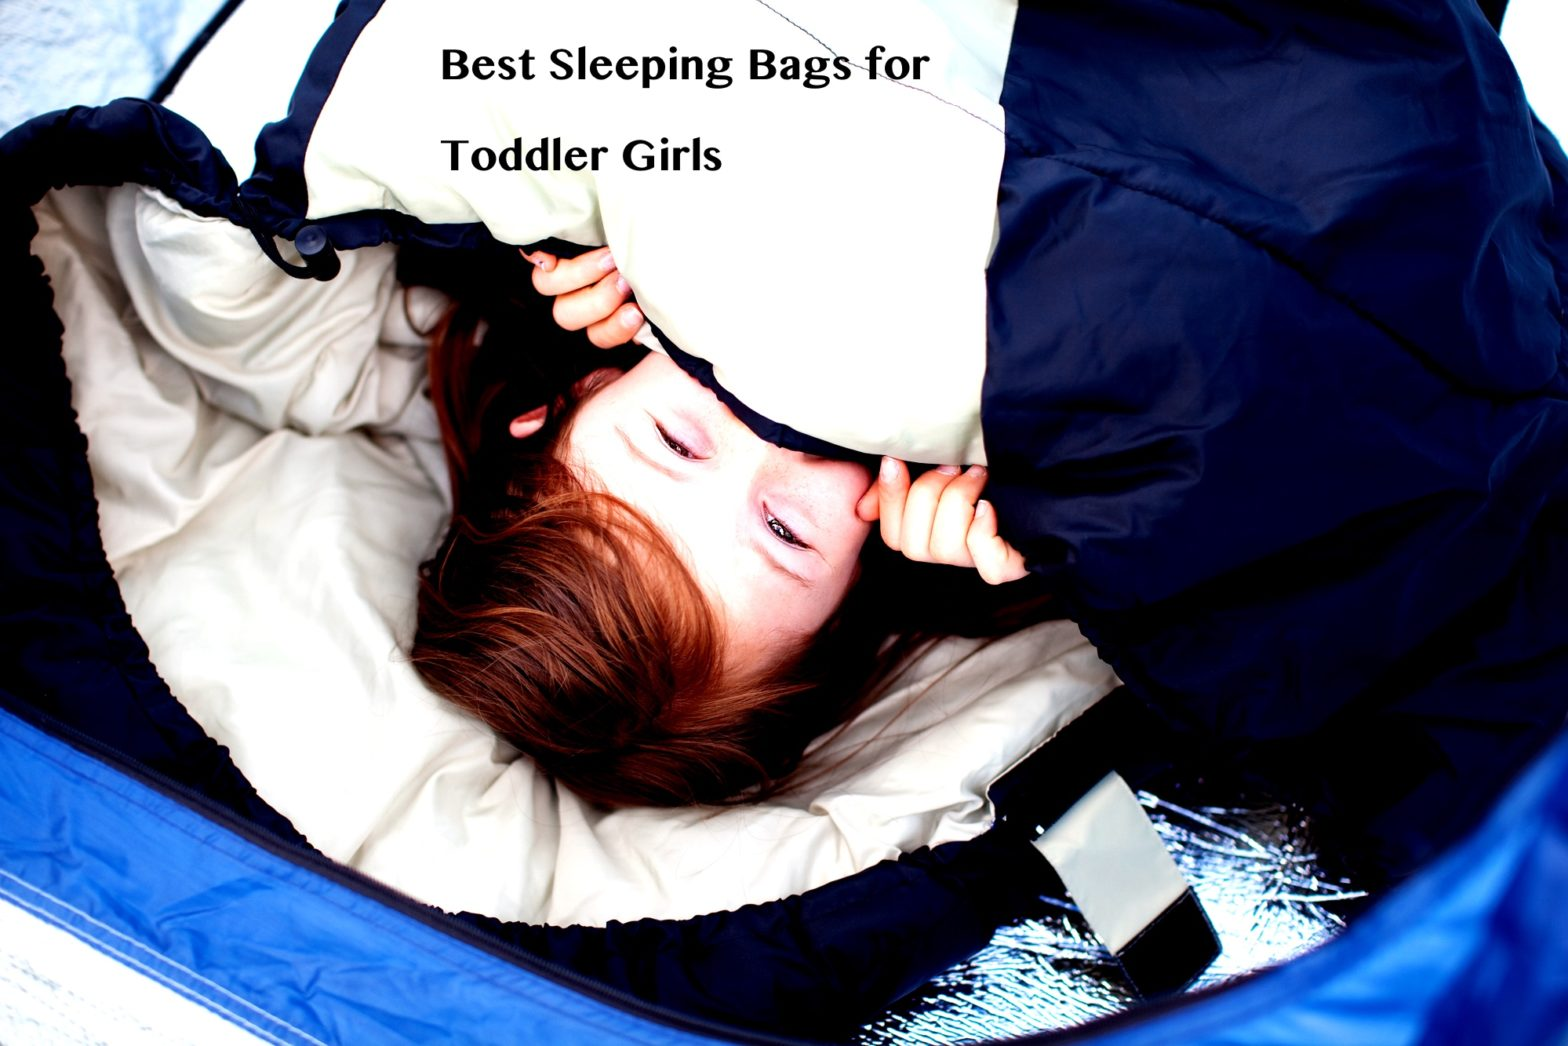 Best Sleeping Bags for Toddler Girls